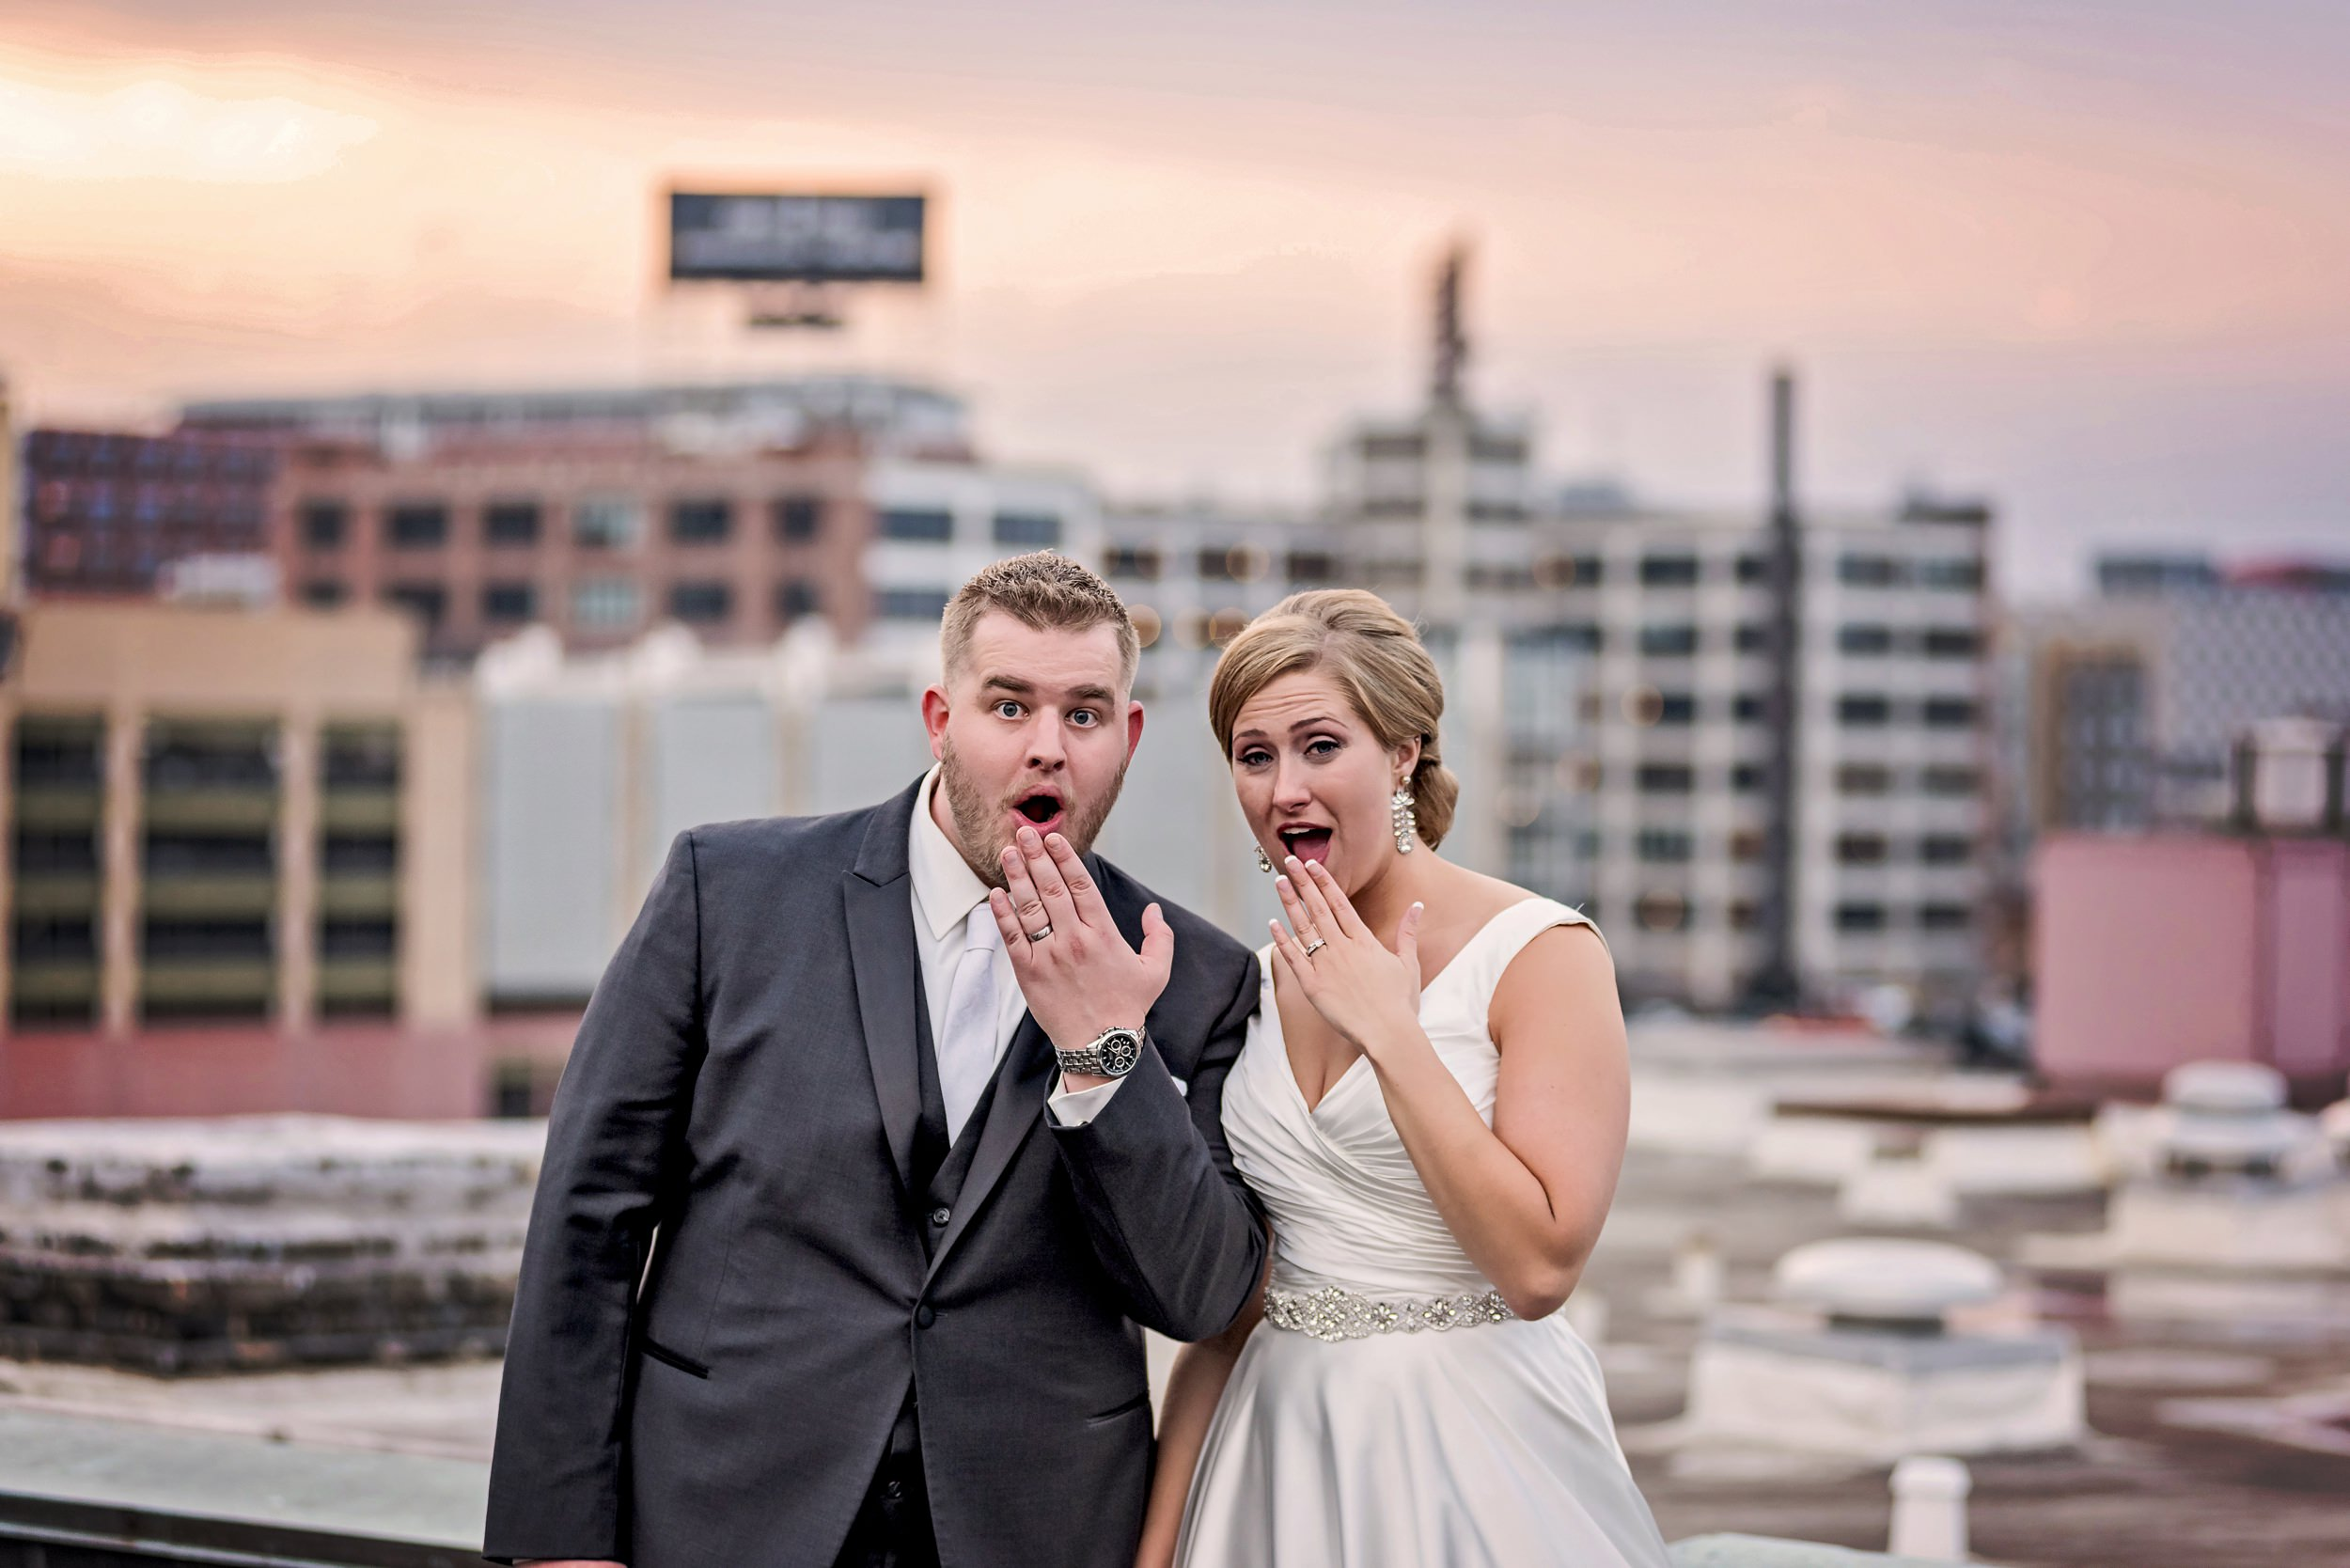 2018-Real-Wedding-Megan-Brenden-Rotella-Photography_0499.jpg